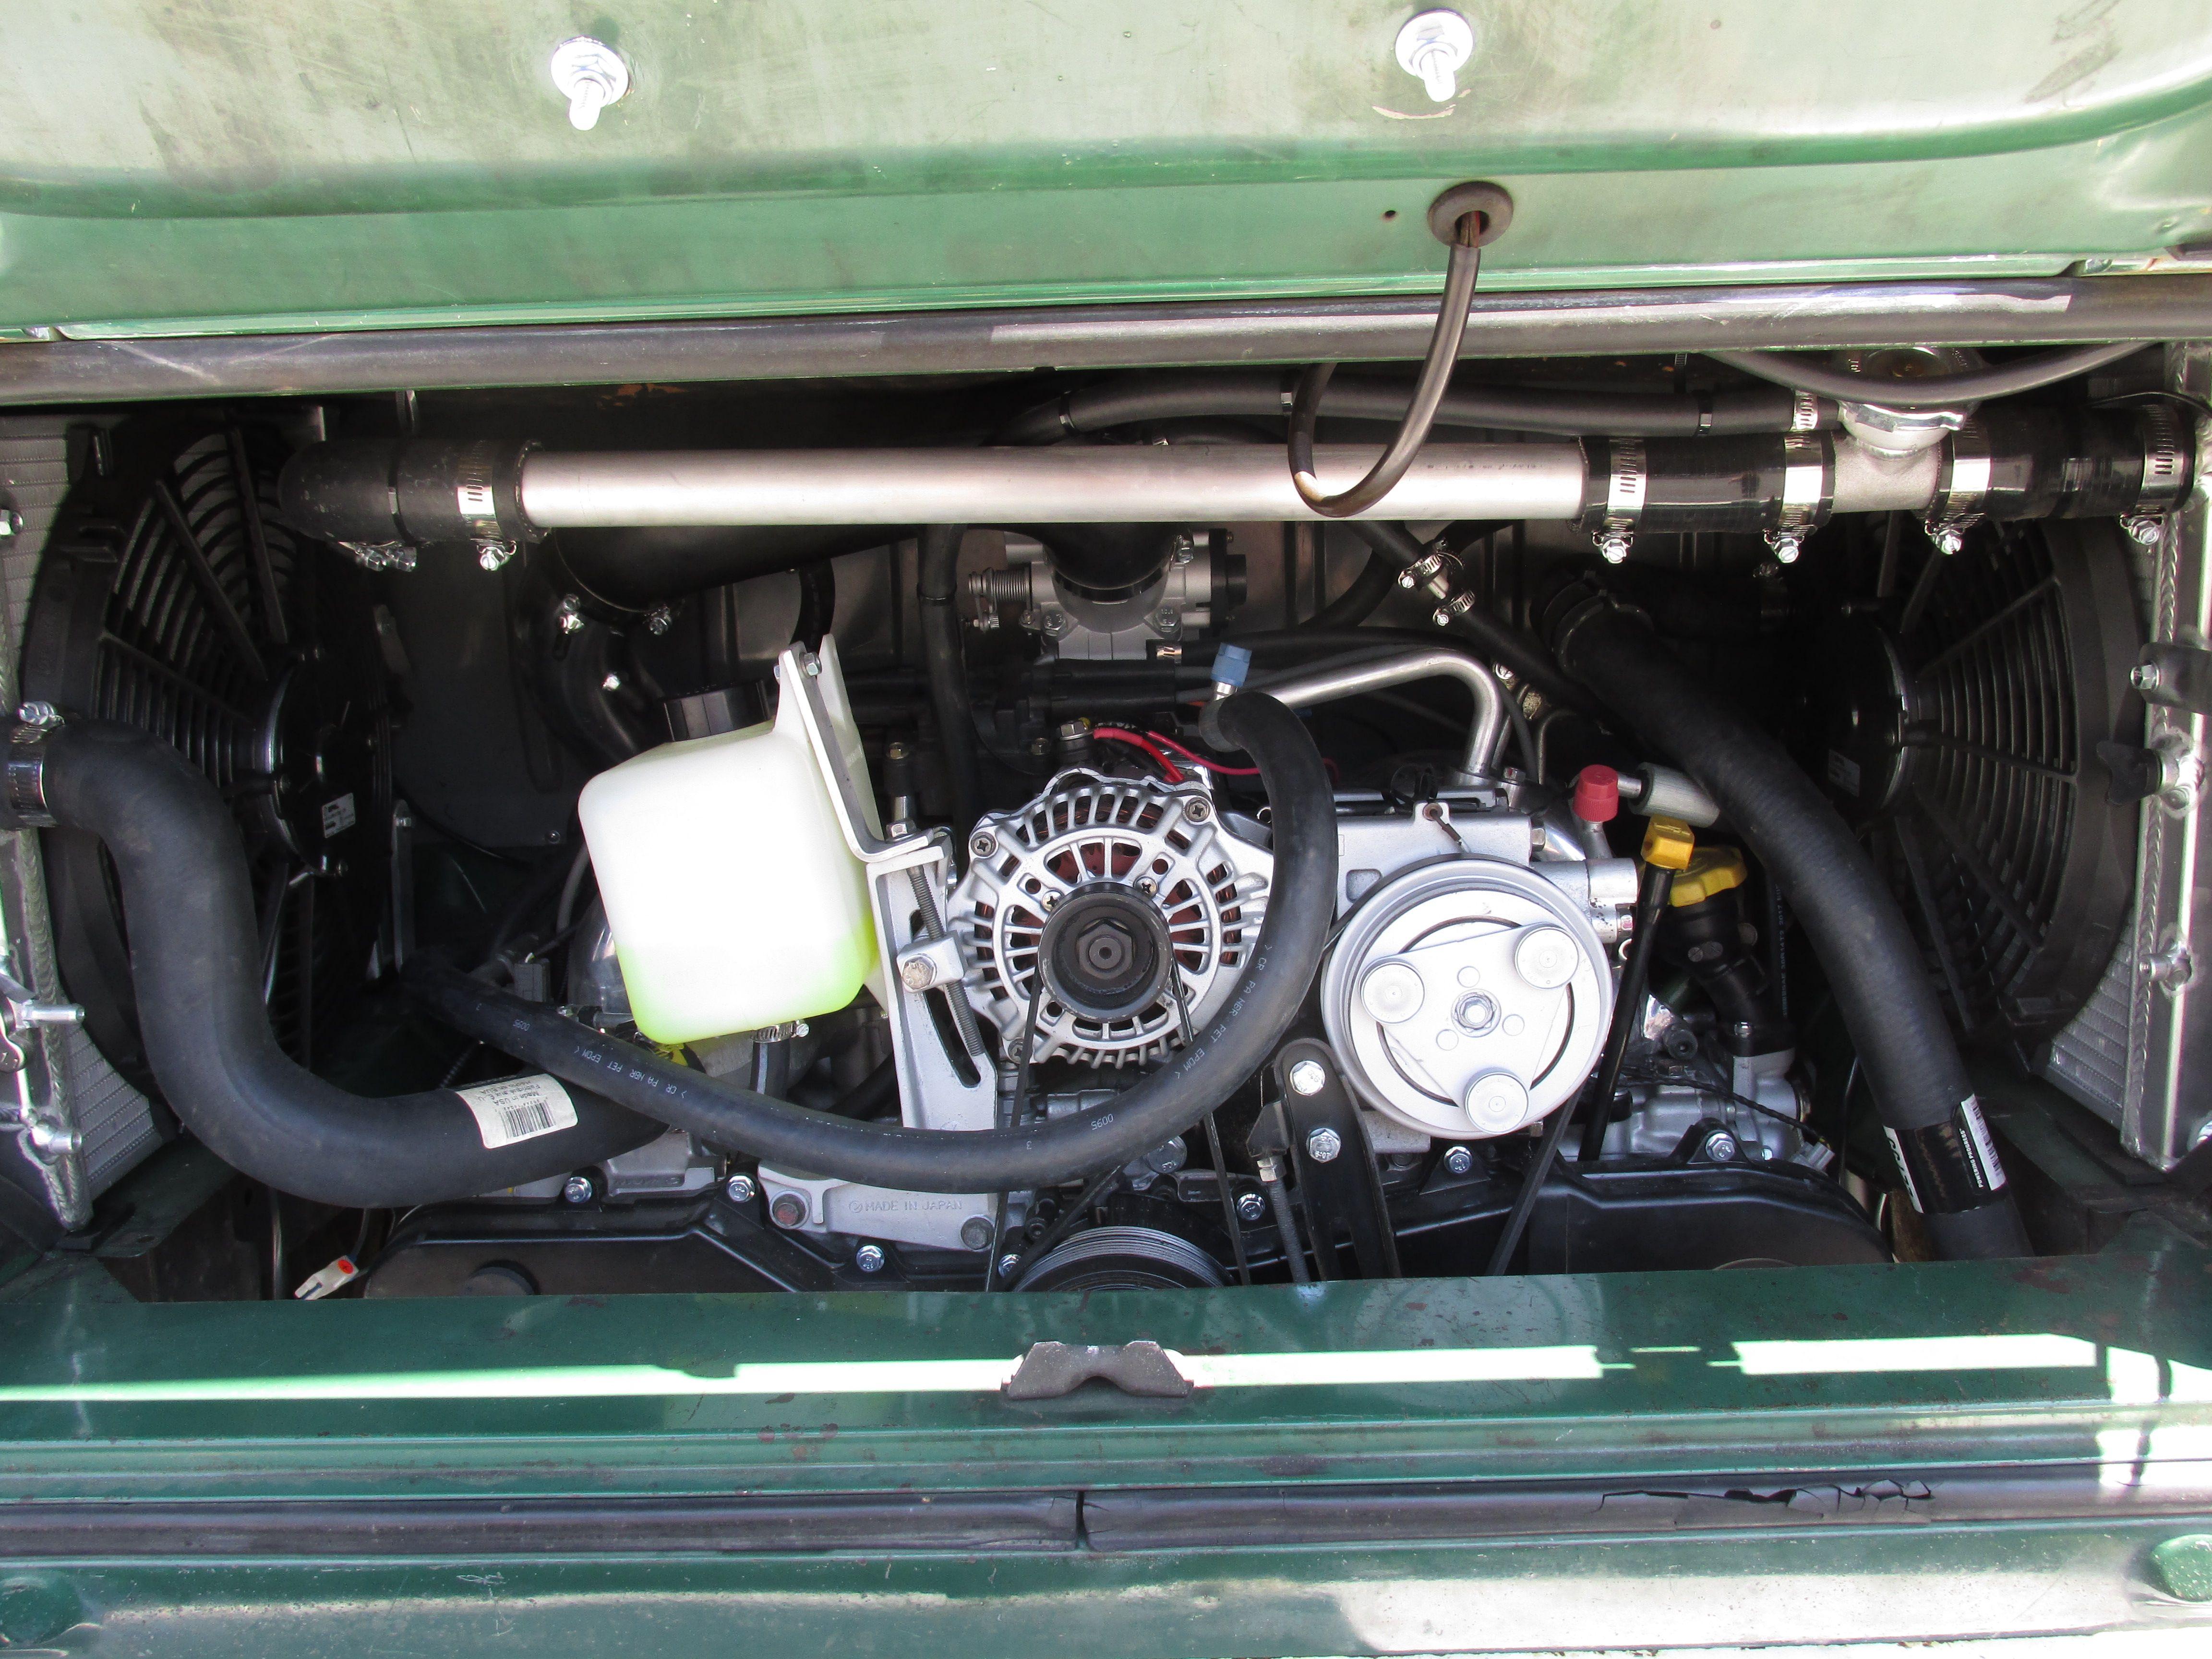 Vanagon Subaru Engine Conversion Vw - Year of Clean Water